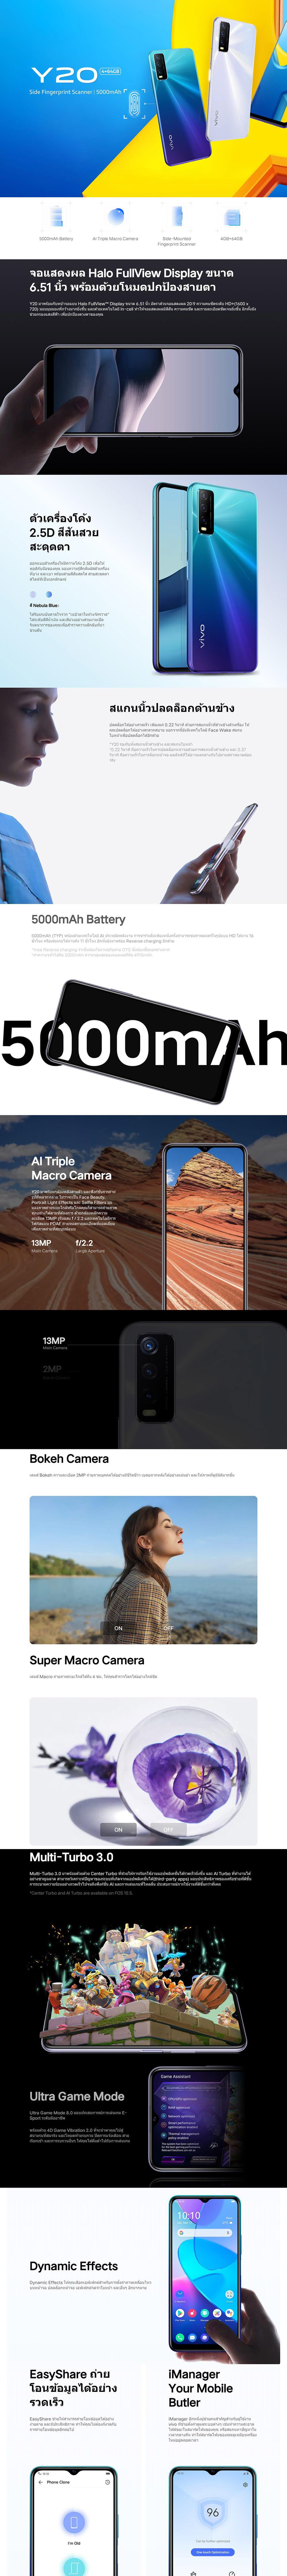 01-3000089921-feature.jpg